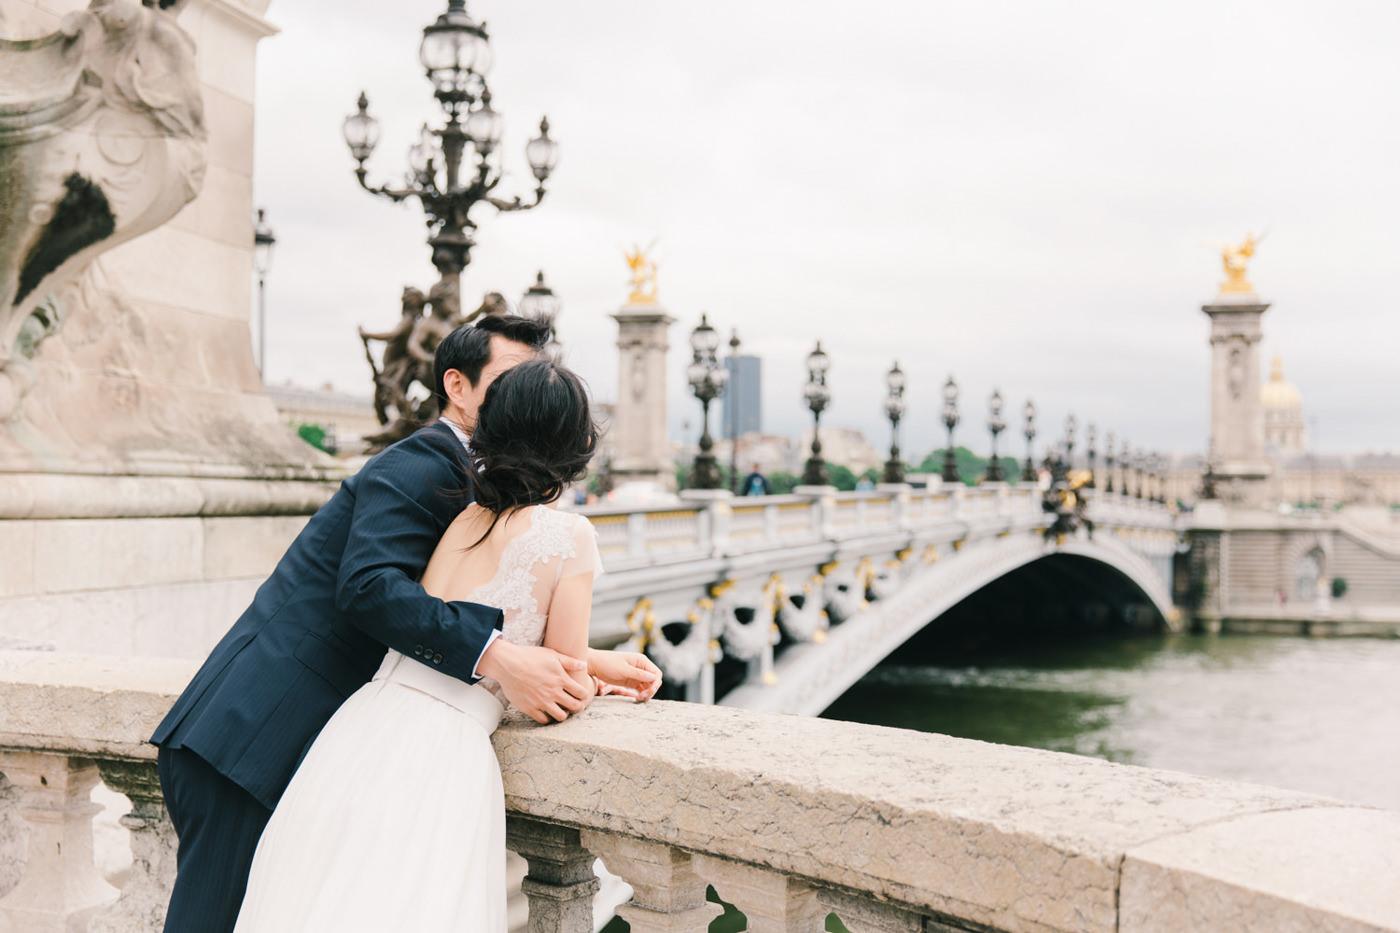 Intimate_Paris_Wedding_Pont_Alexandre_III_Photoshoot_Engagement_